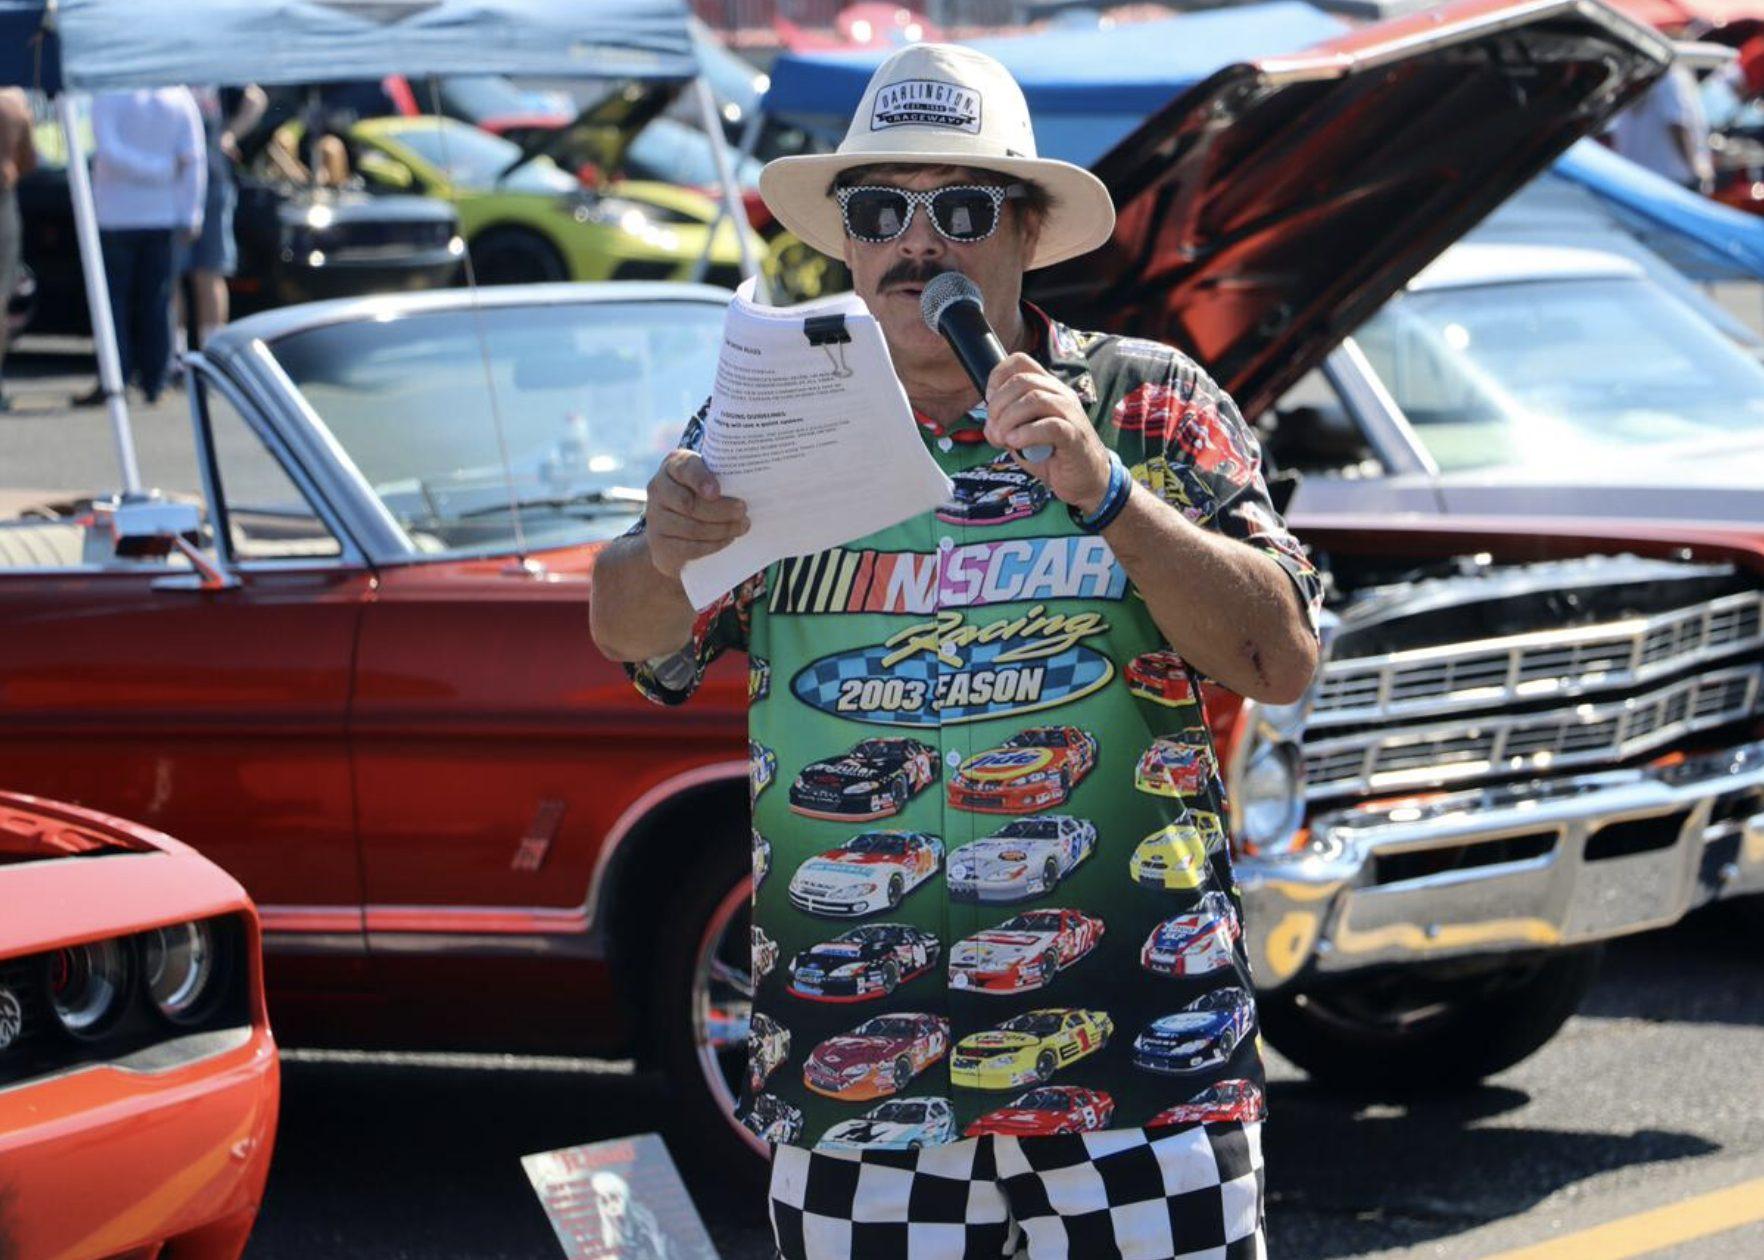 Darlington Raceway plays host to Classic Car Show, Track Laps